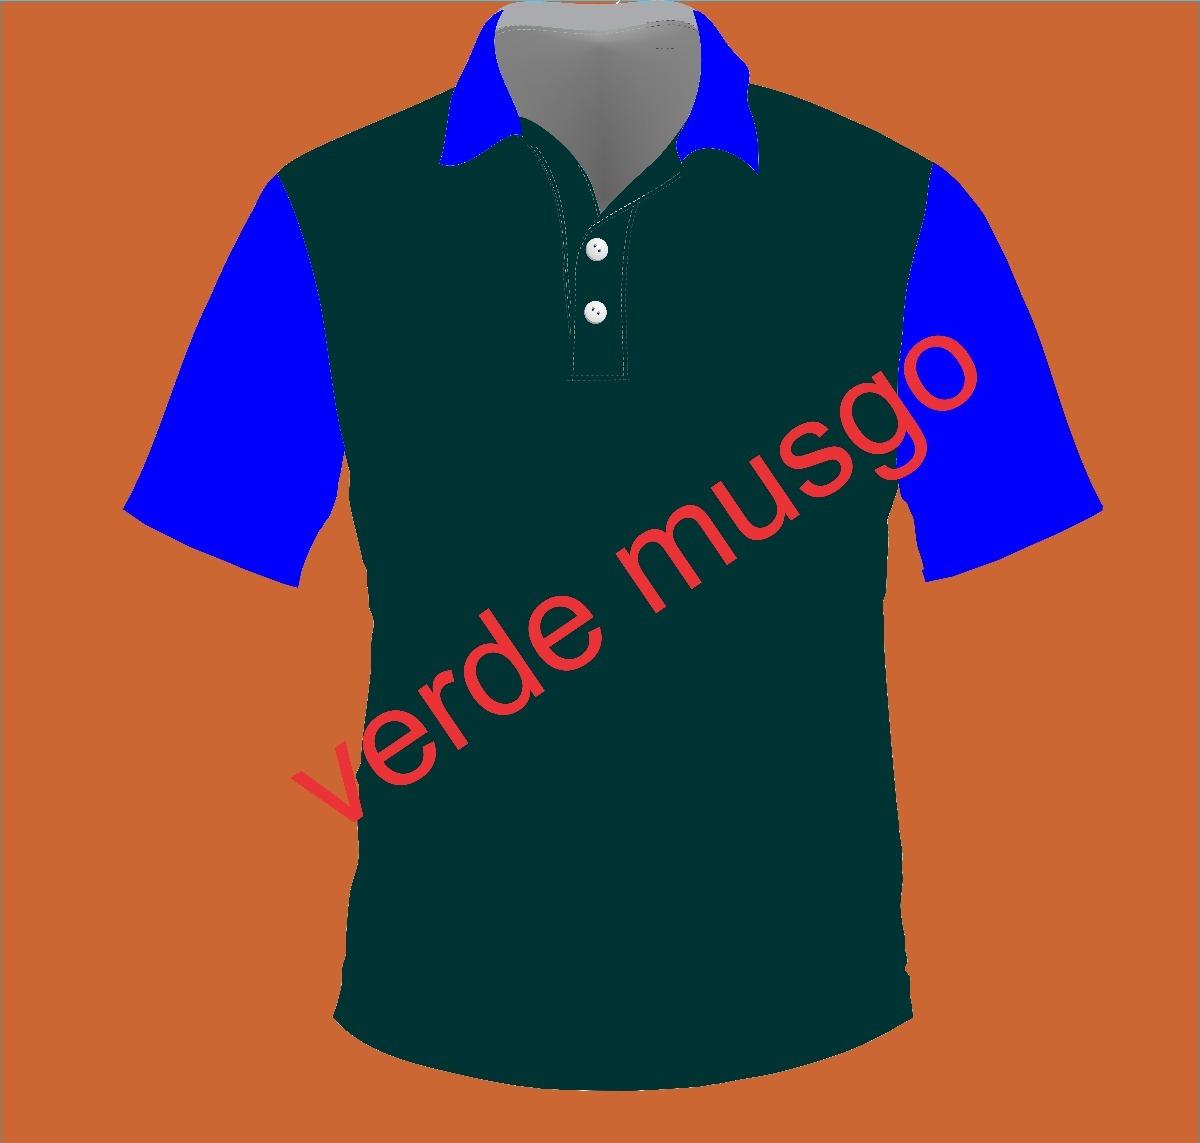 e1b20012e7 10 Camiseta Polo Personalizada Uniforme - R  344